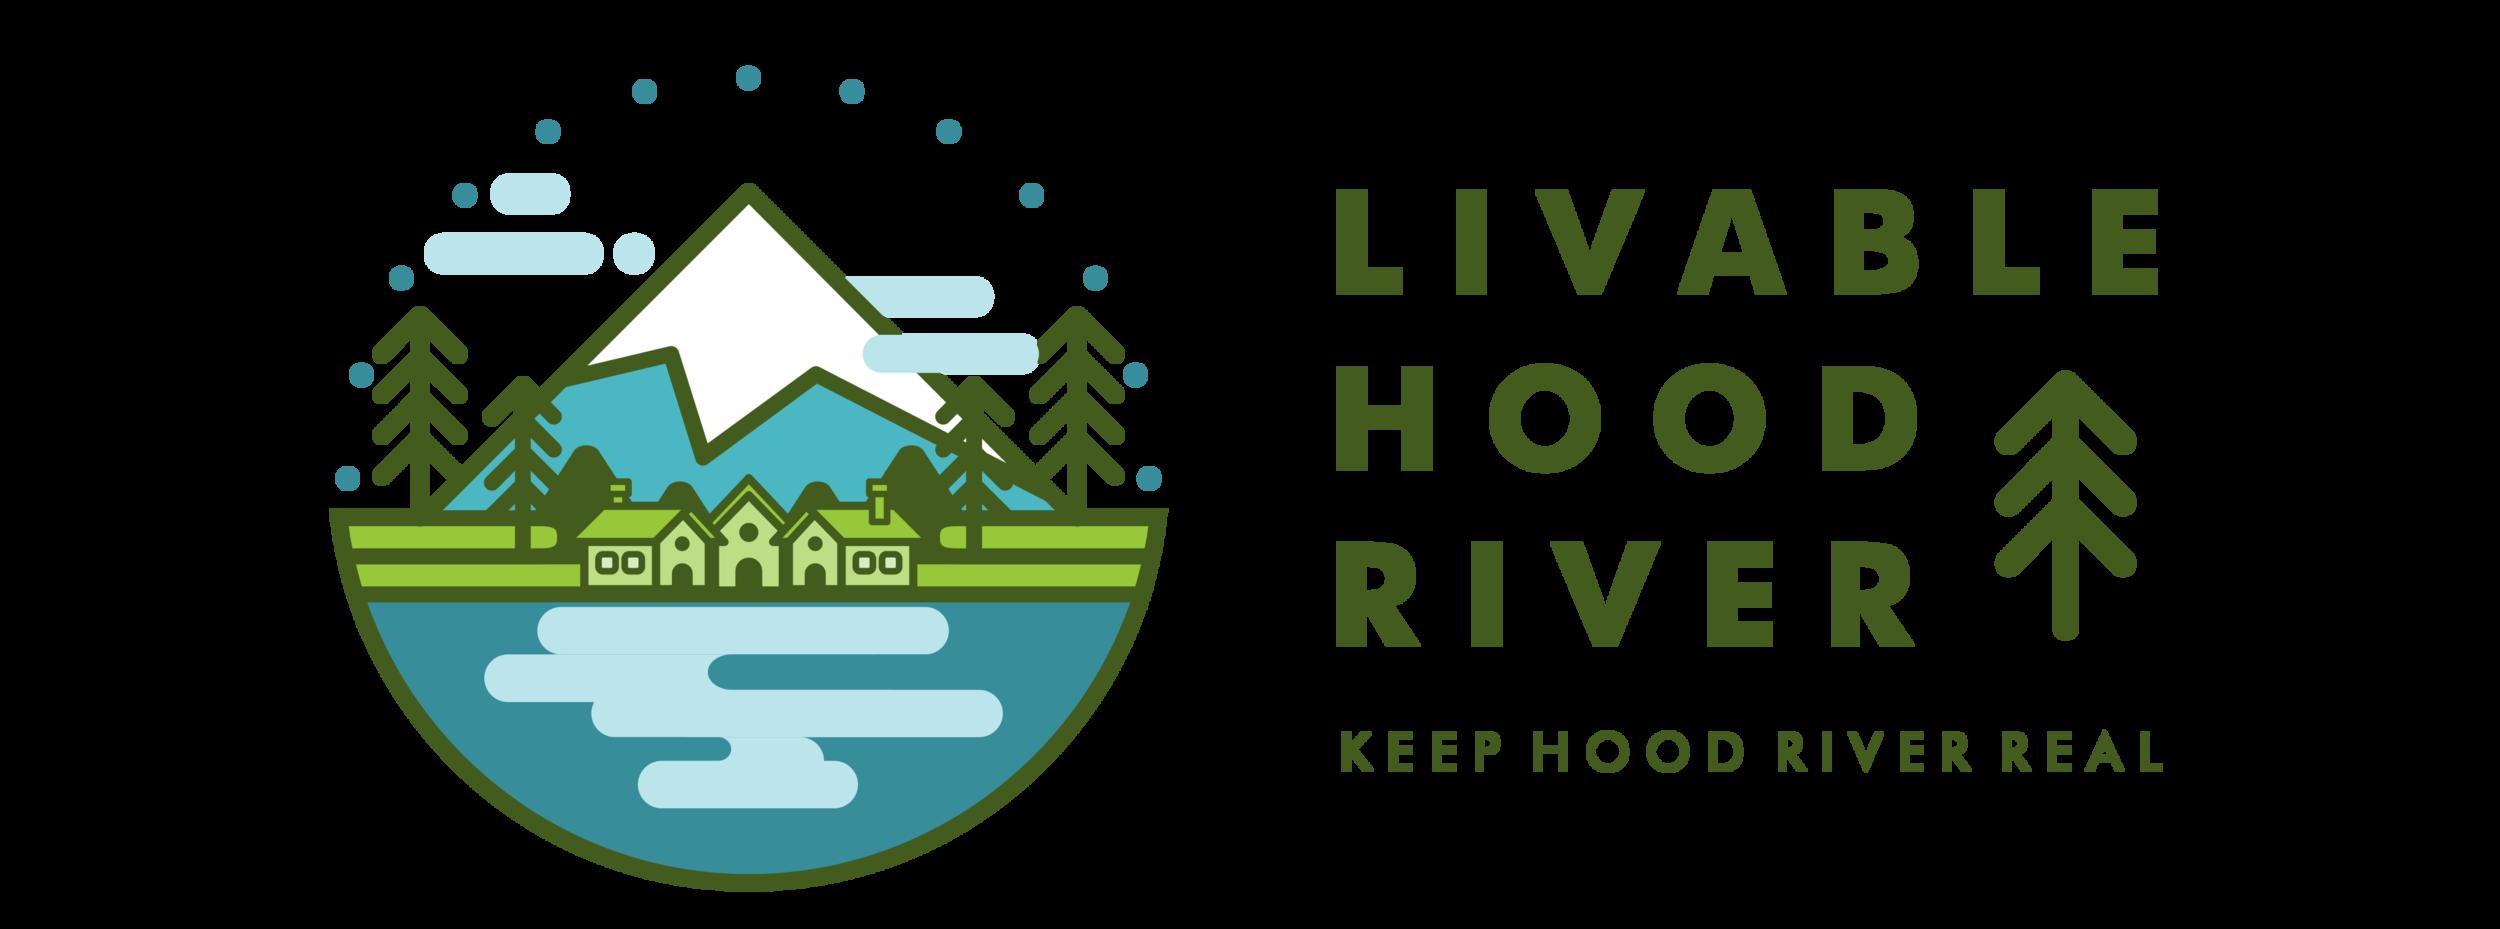 LIVABLE-HOOD-RIVER.png